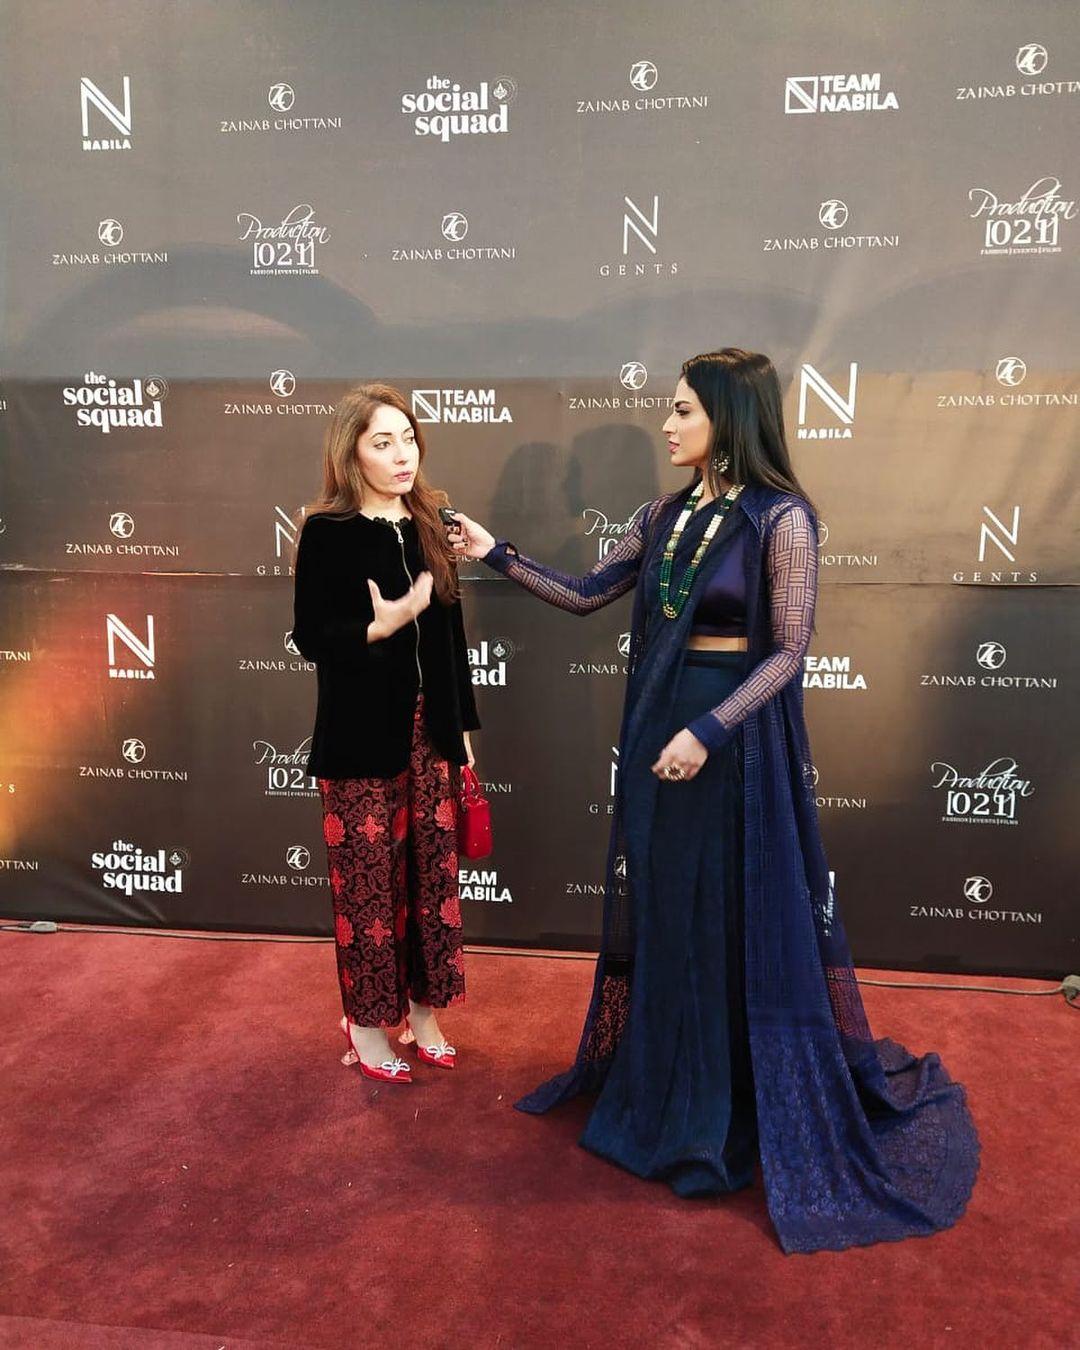 Beautiful Clicks of Celebrities Spotted at Zainab Chotani Fashion Show